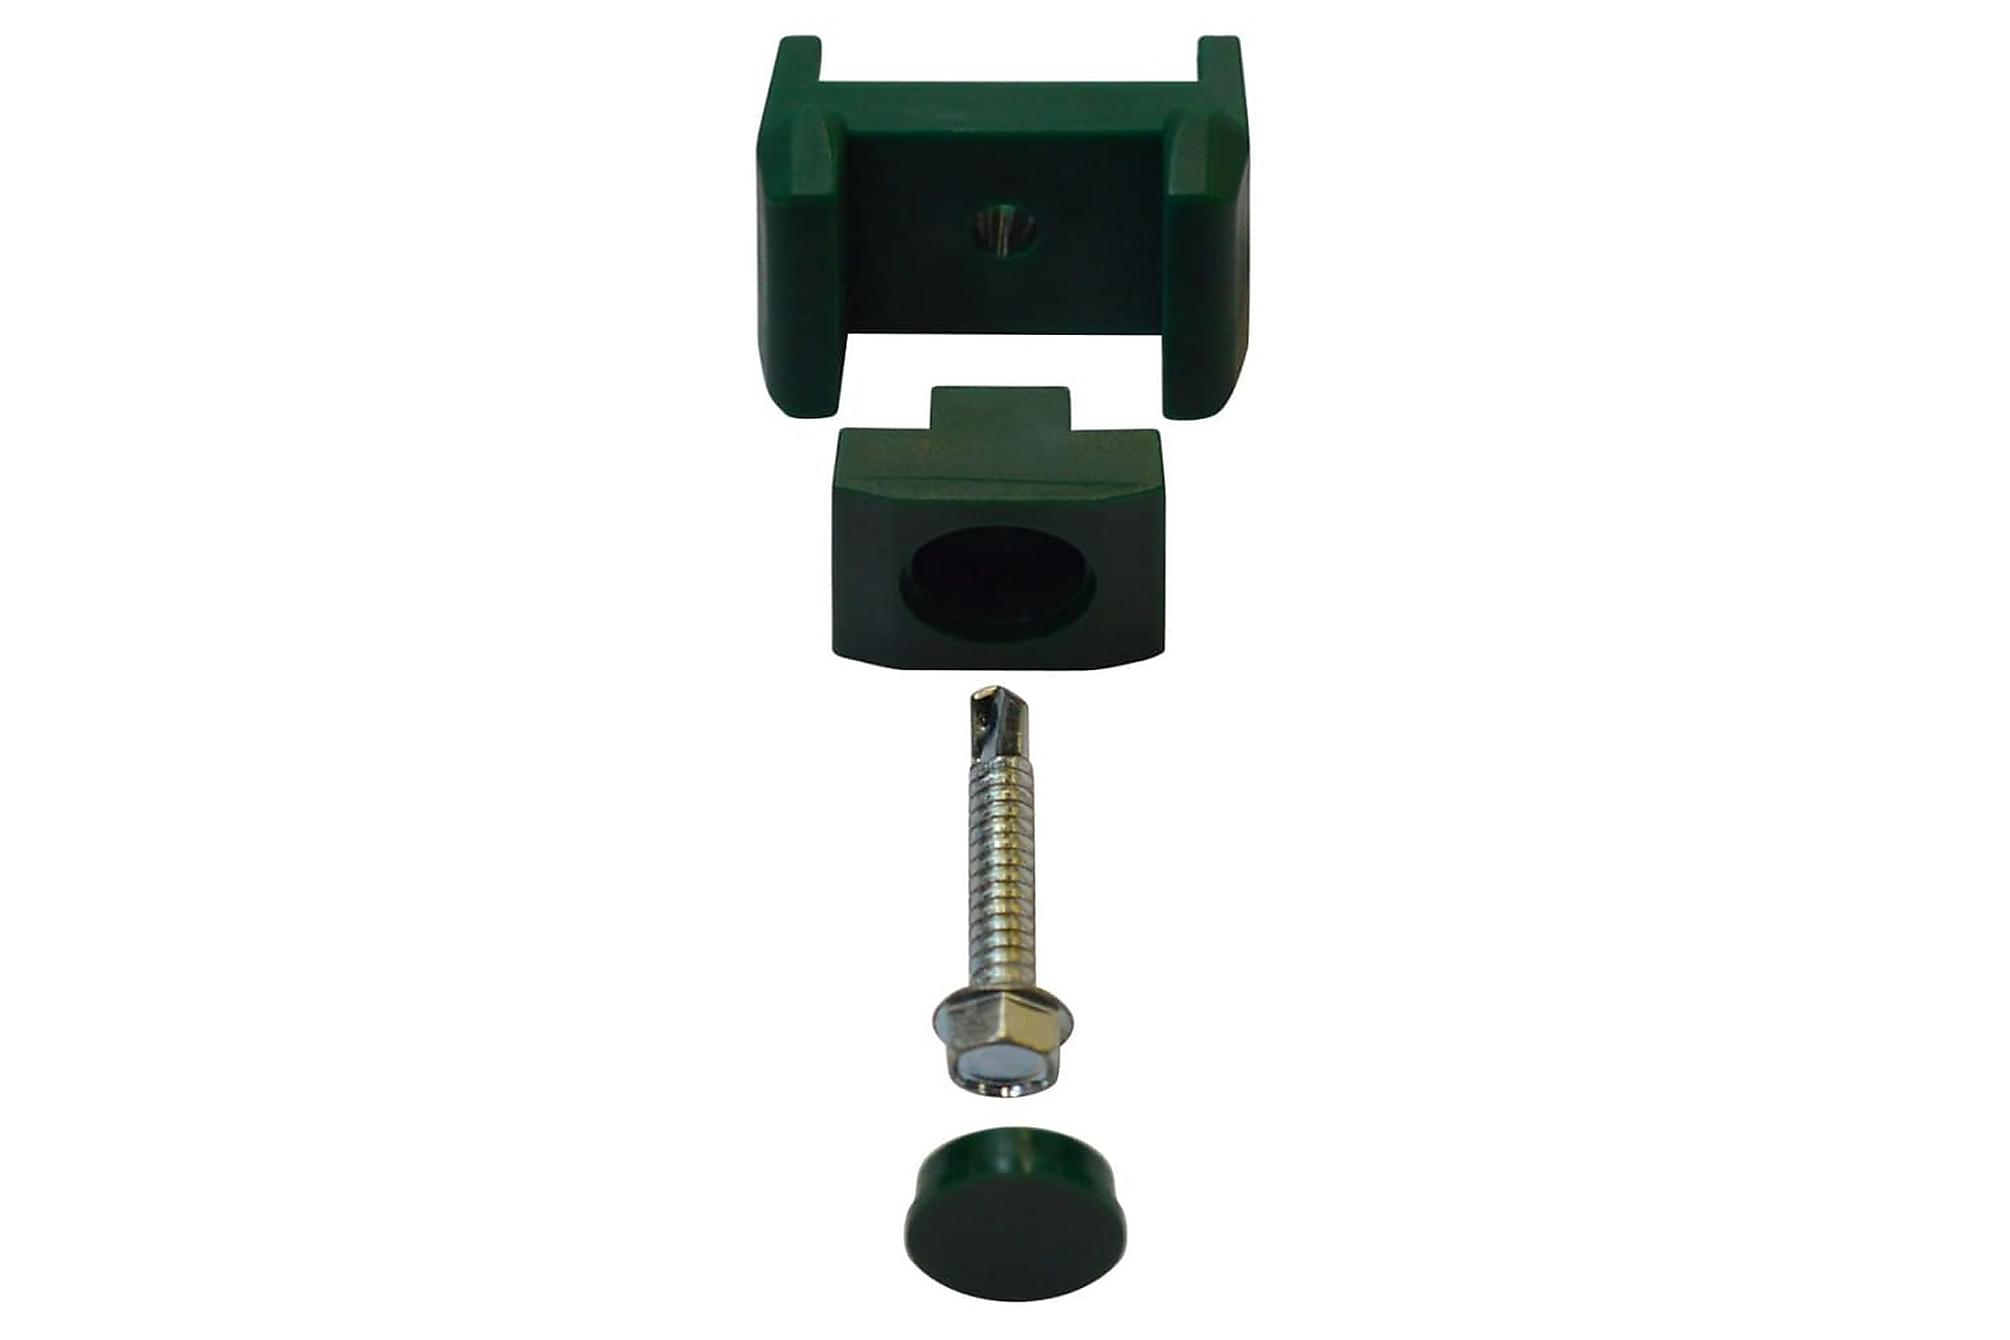 2D Stängselpaneler med stolpar 2008x2230 mm 12 m grön, Staket & grindar